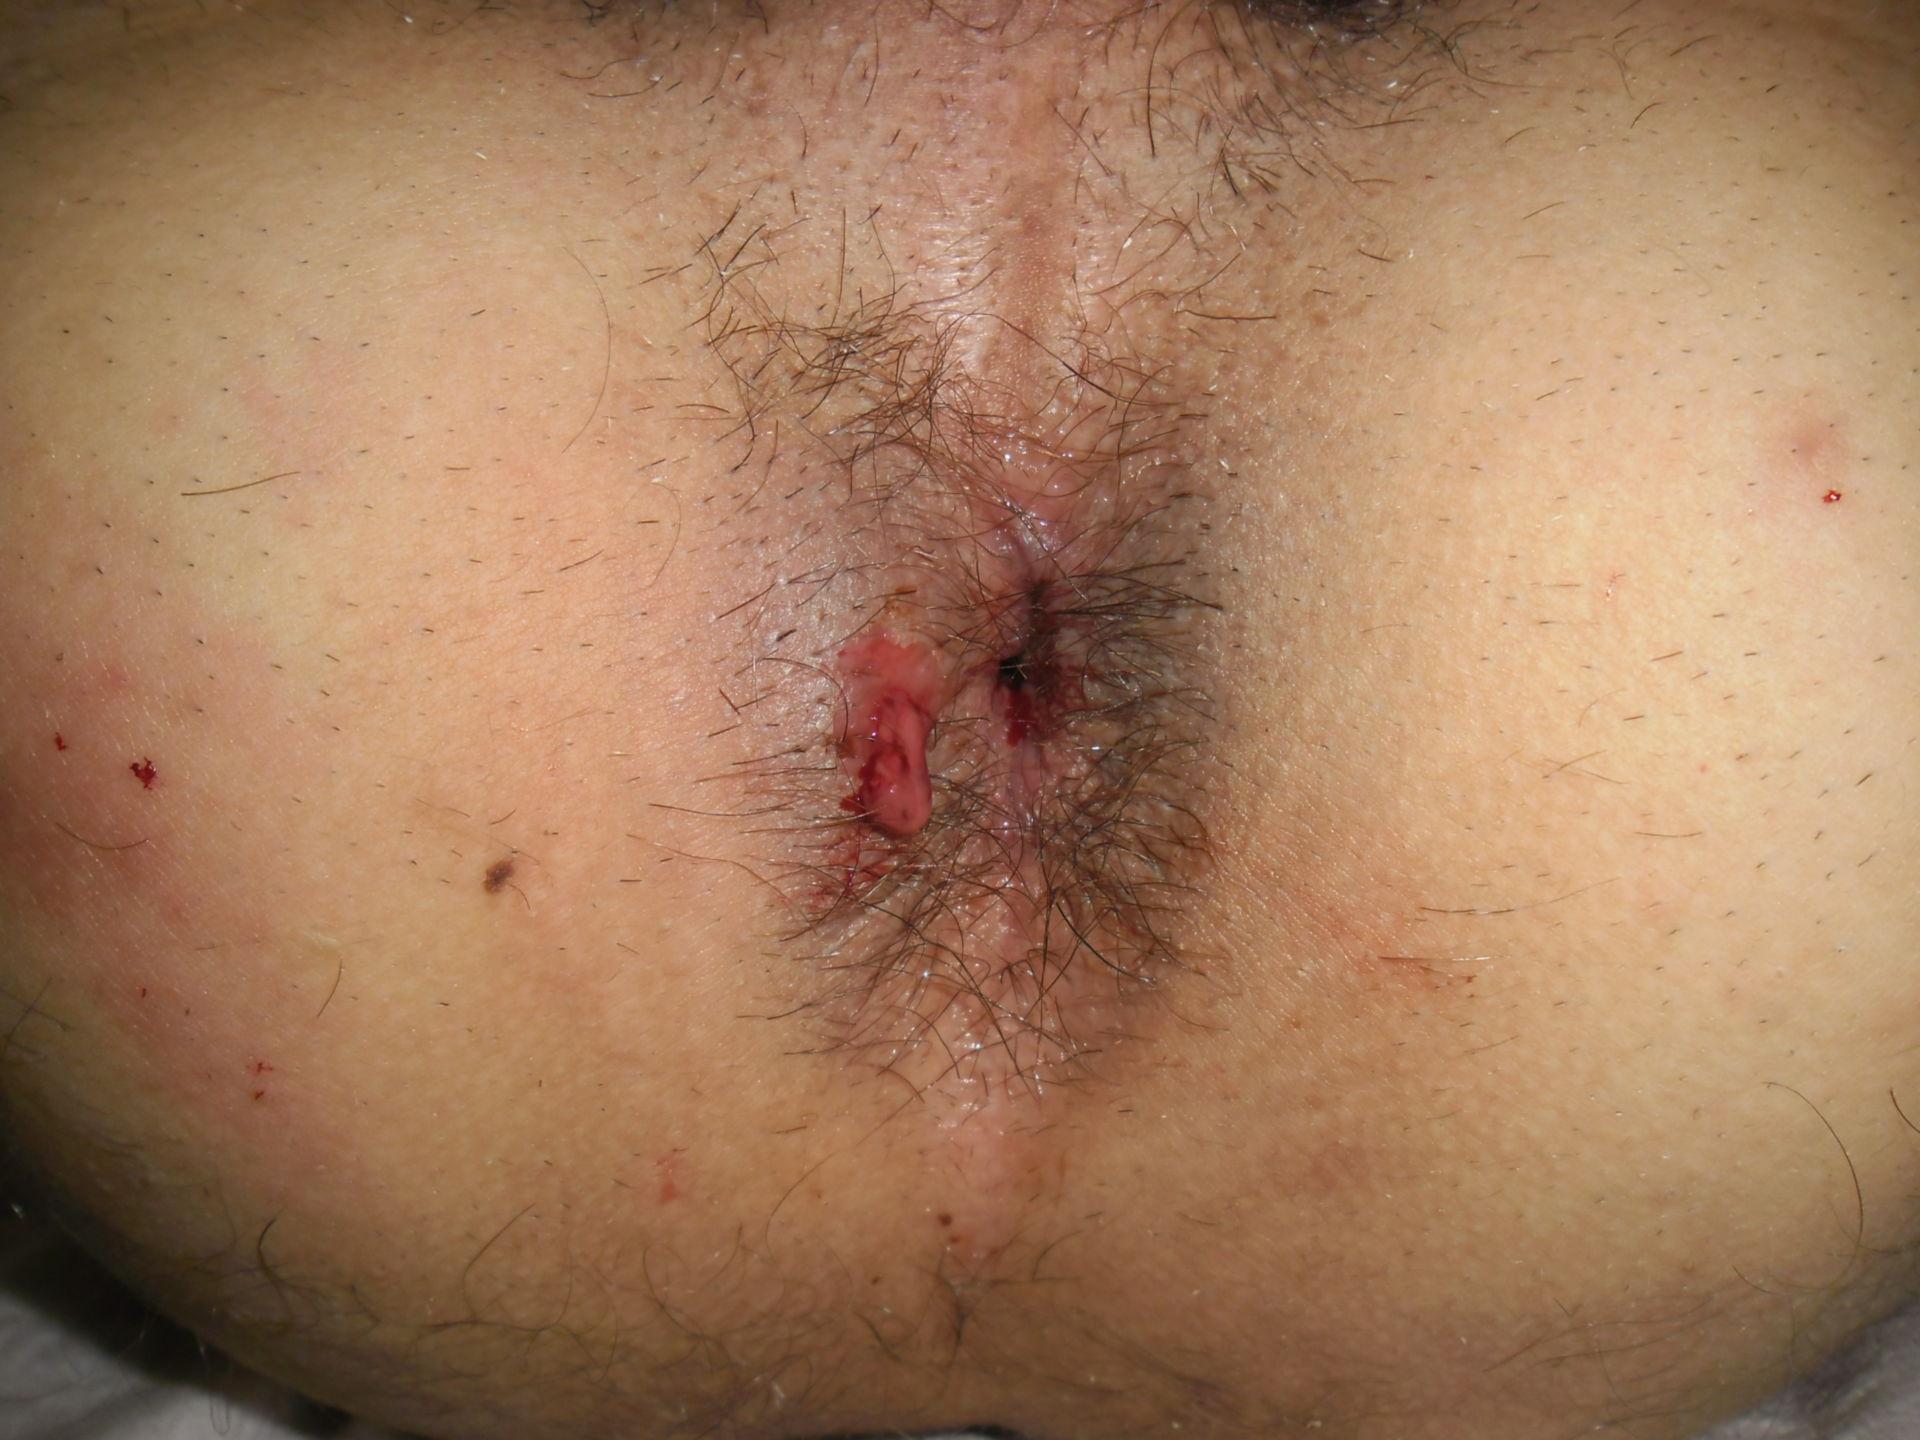 Morbus Crohn bedingter Analabszess